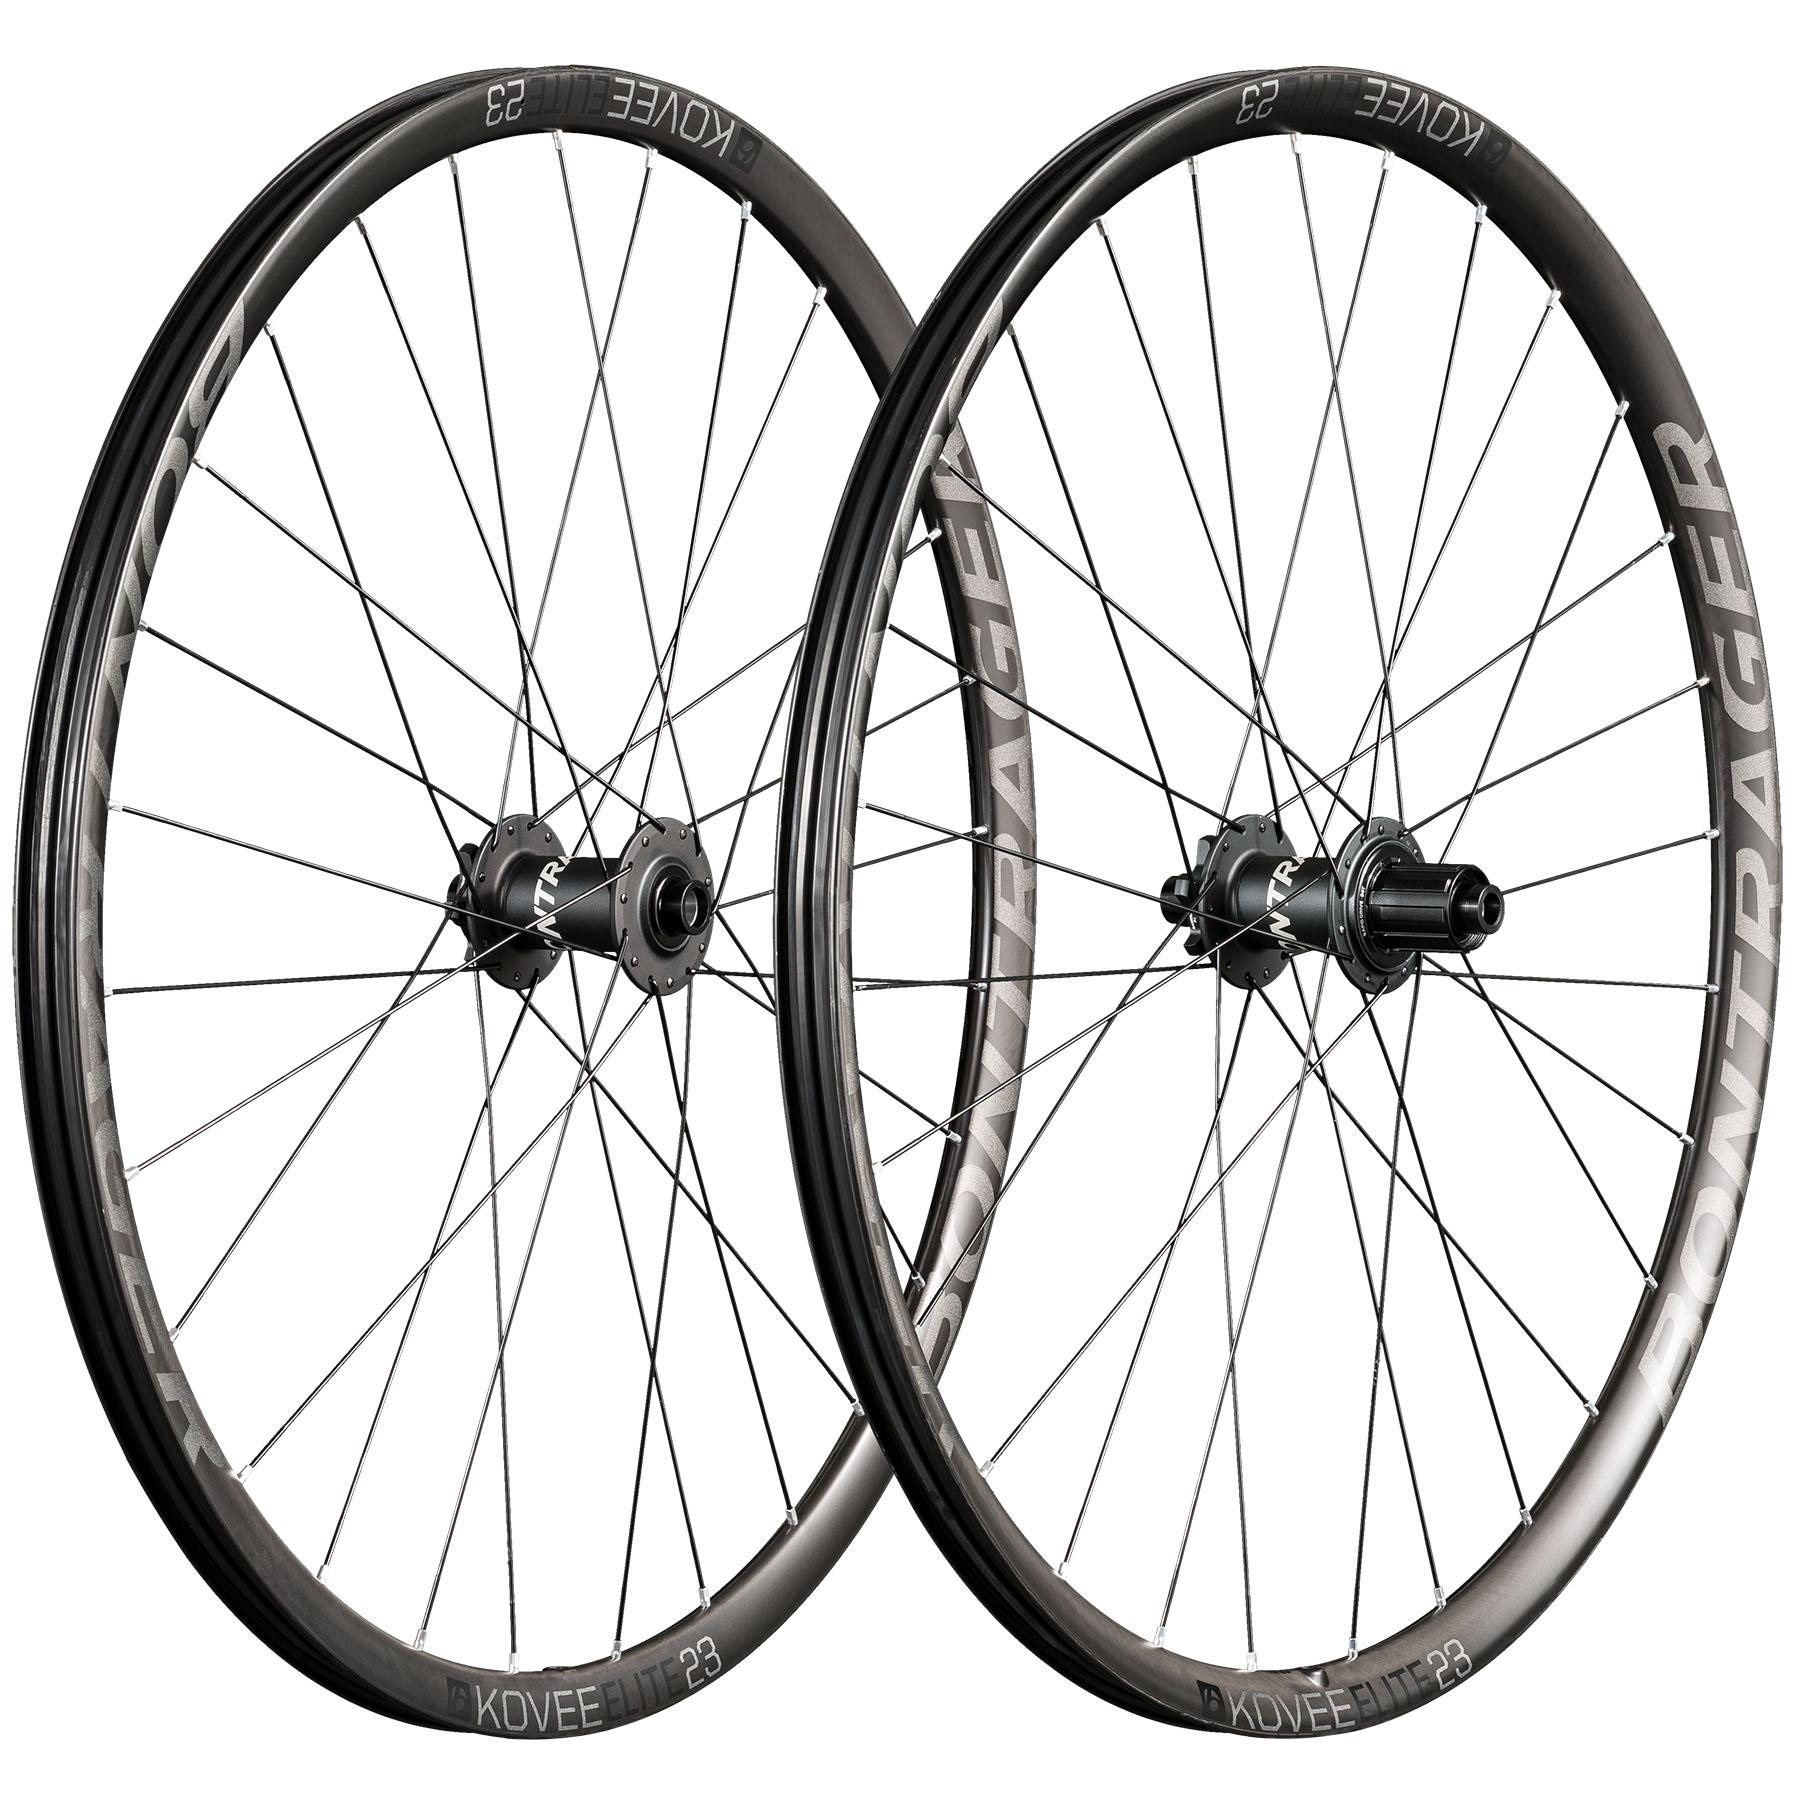 Bontrager Offers $700 Carbon MTB Wheel Set, Adds New Line